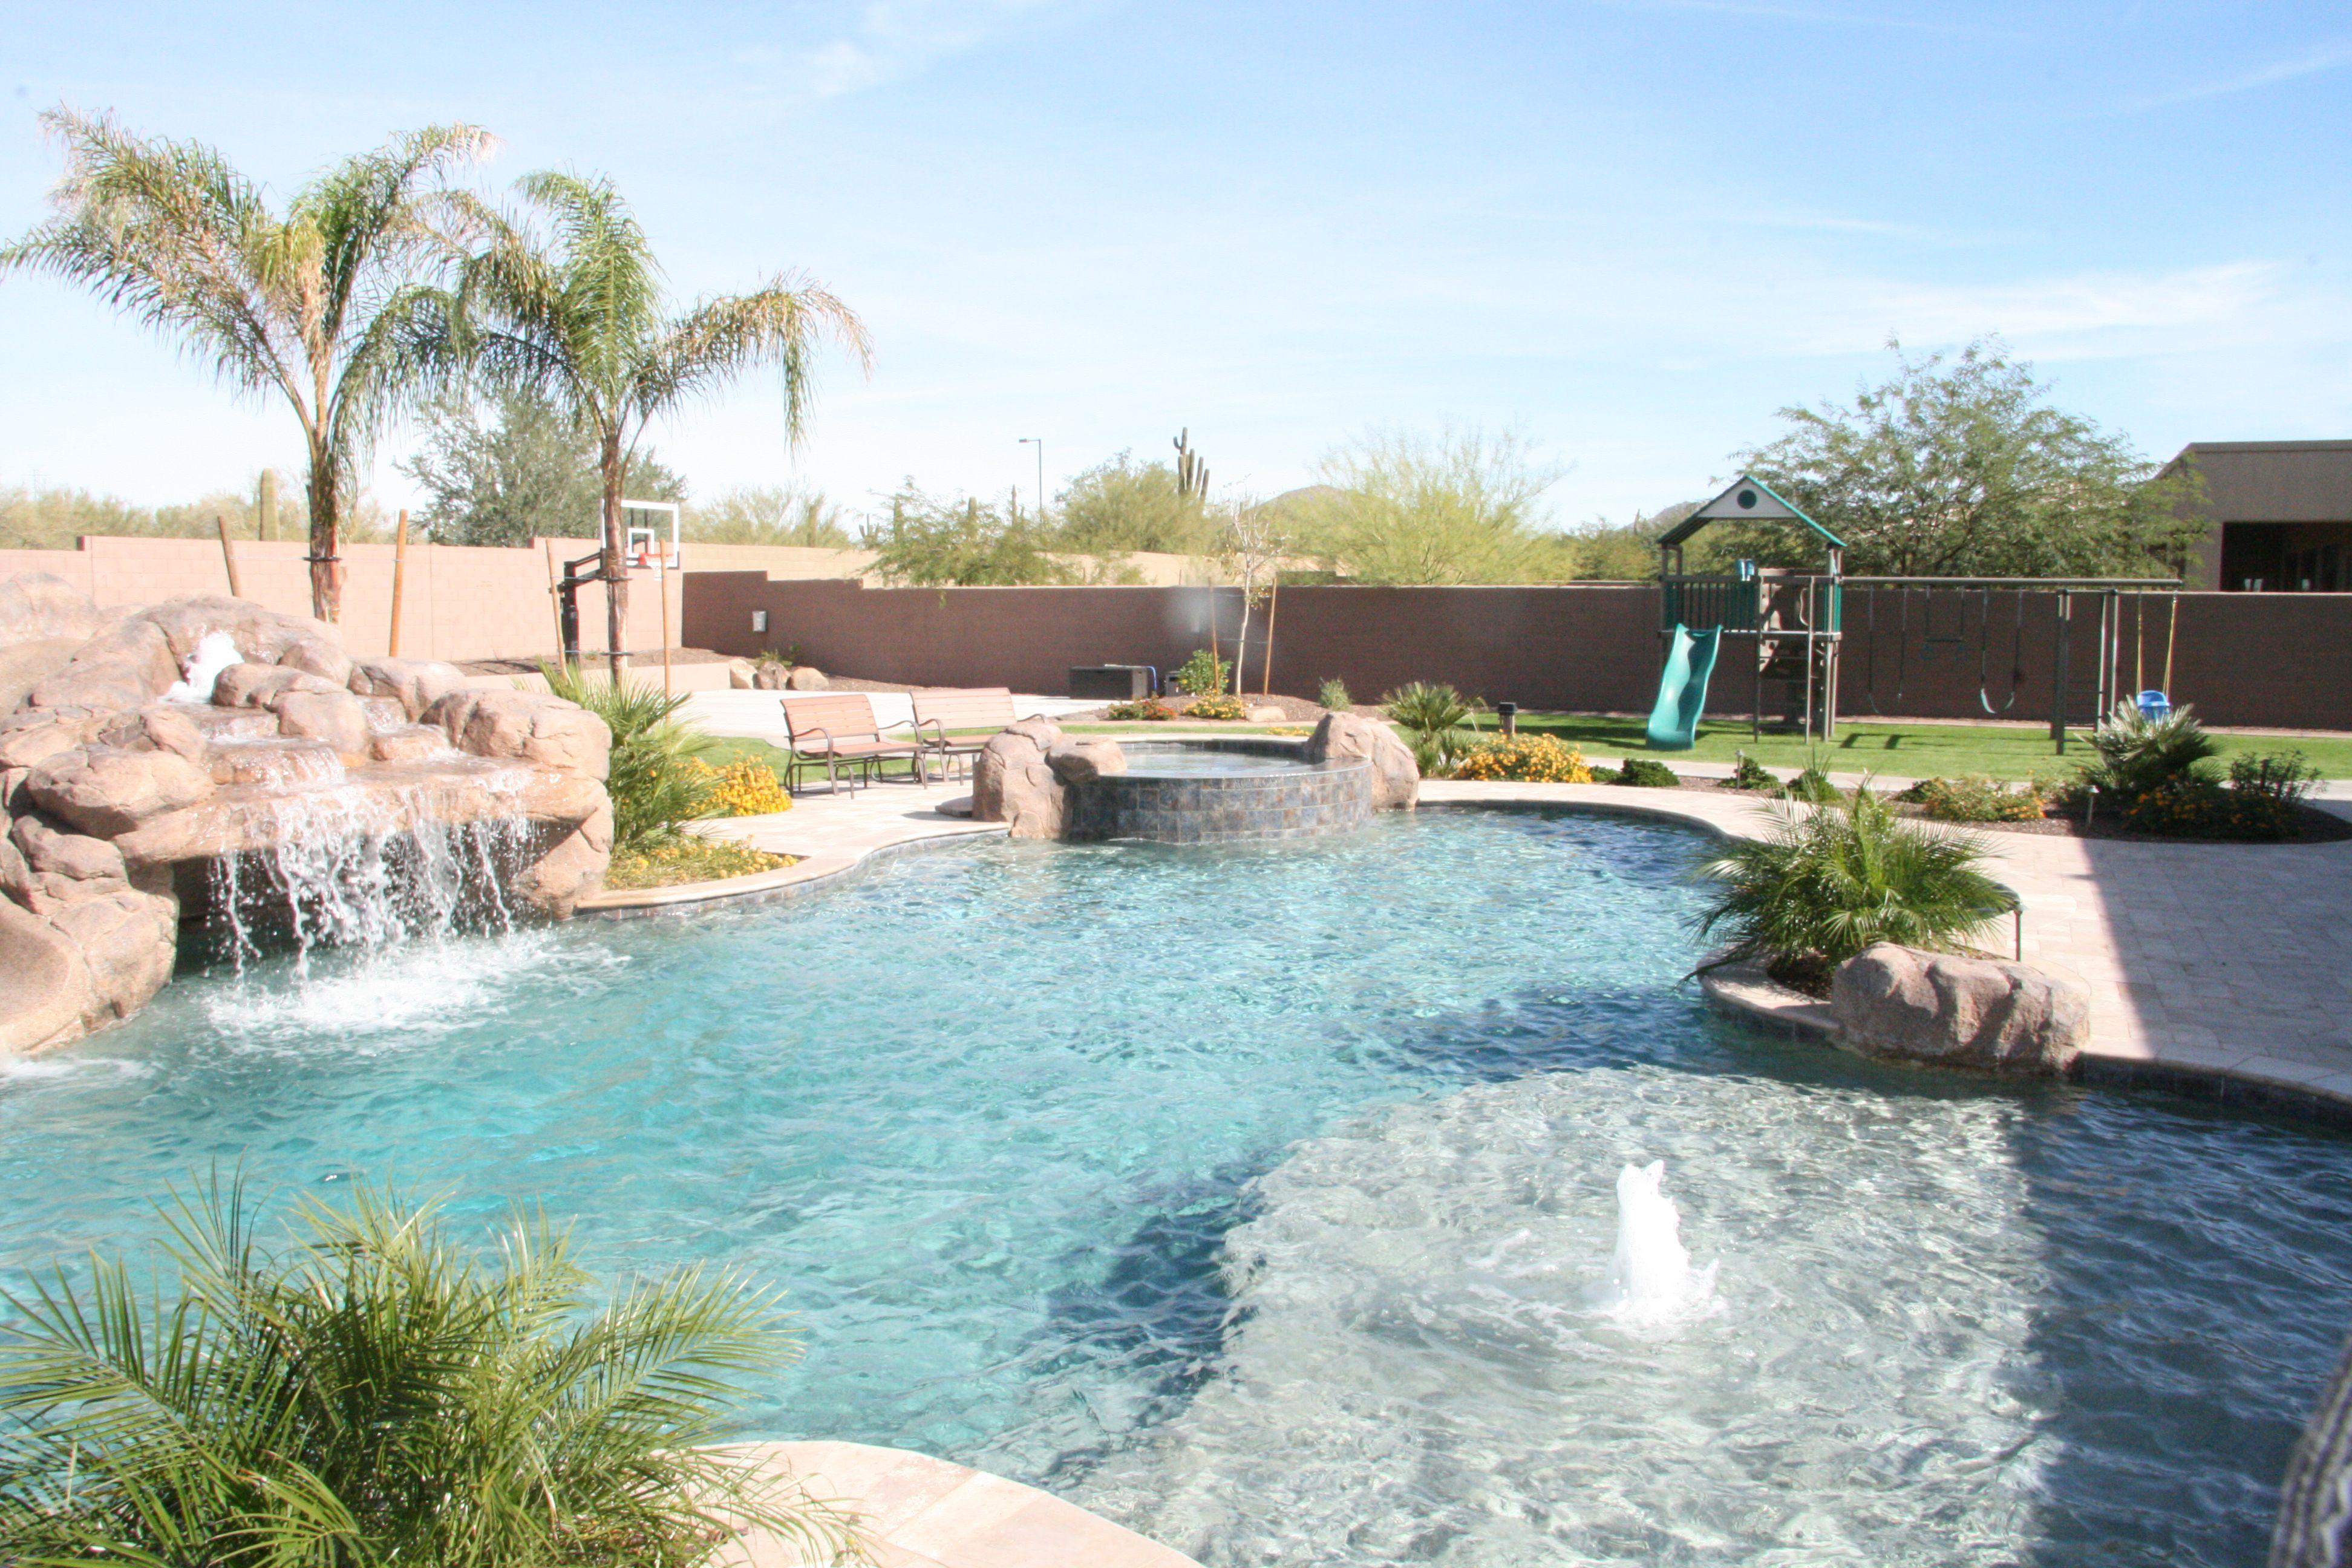 Freeform, Lagoon-style pool in Scottsdale, AZ by Unique Landscapes & Custom  Pools